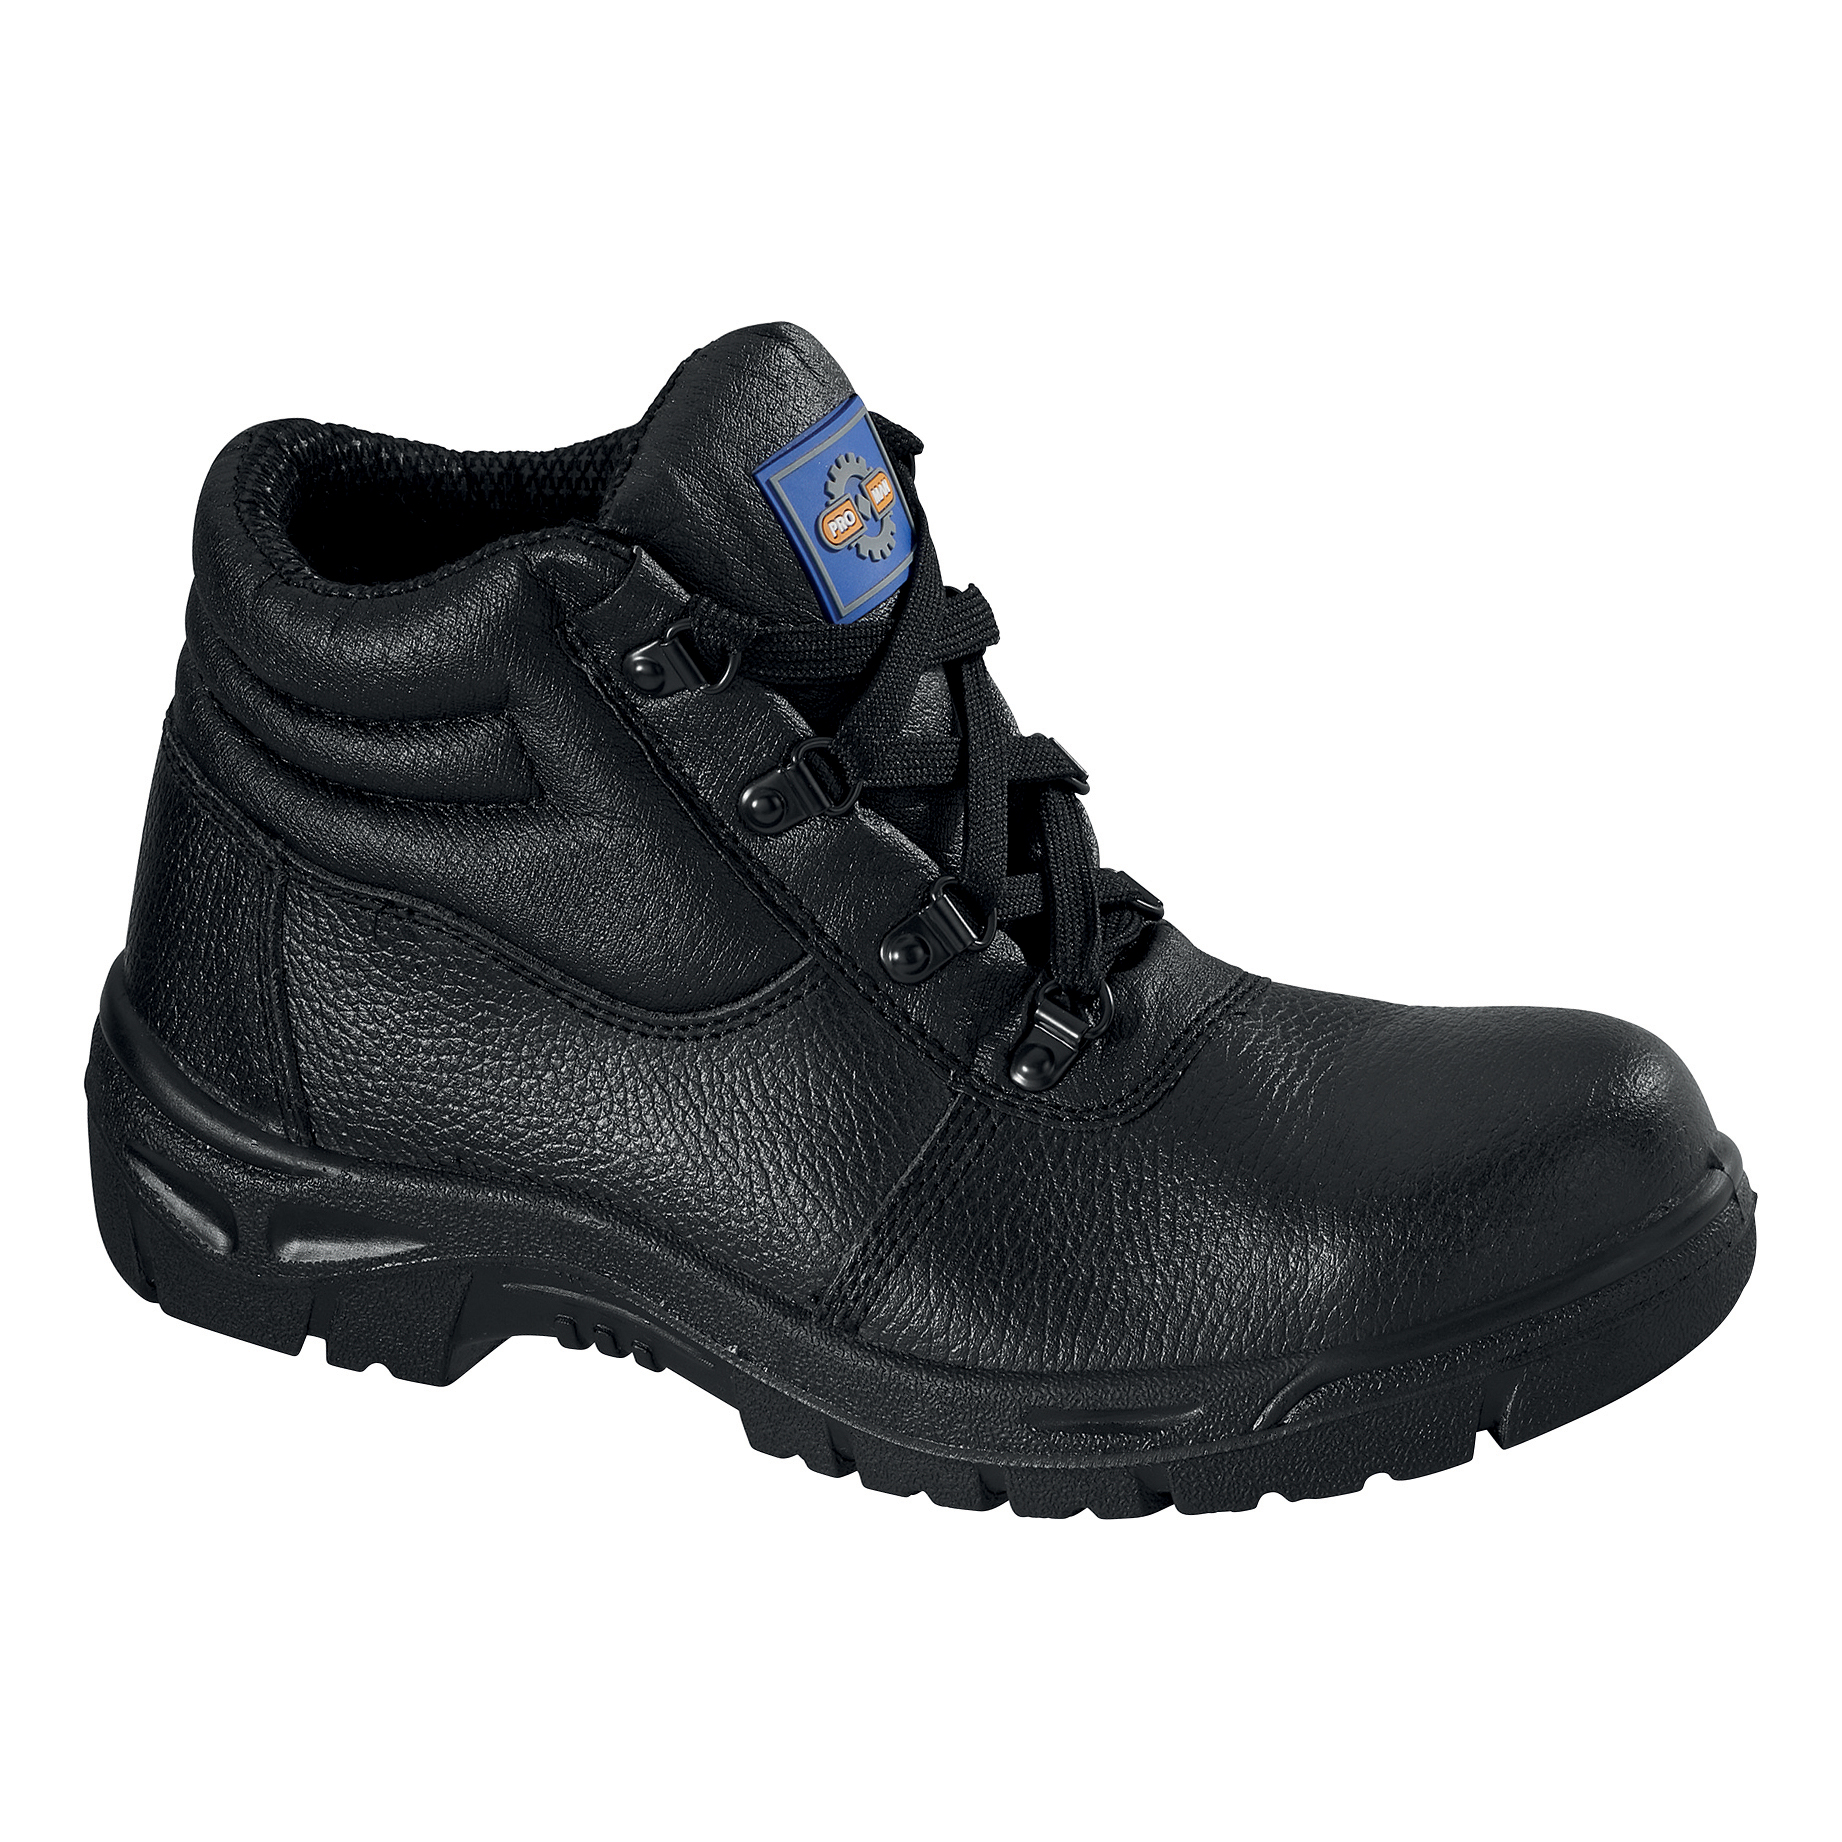 Rockfall ProMan Chukka Boot Leather Steel Toecap Black Size 13 Ref PM100 13